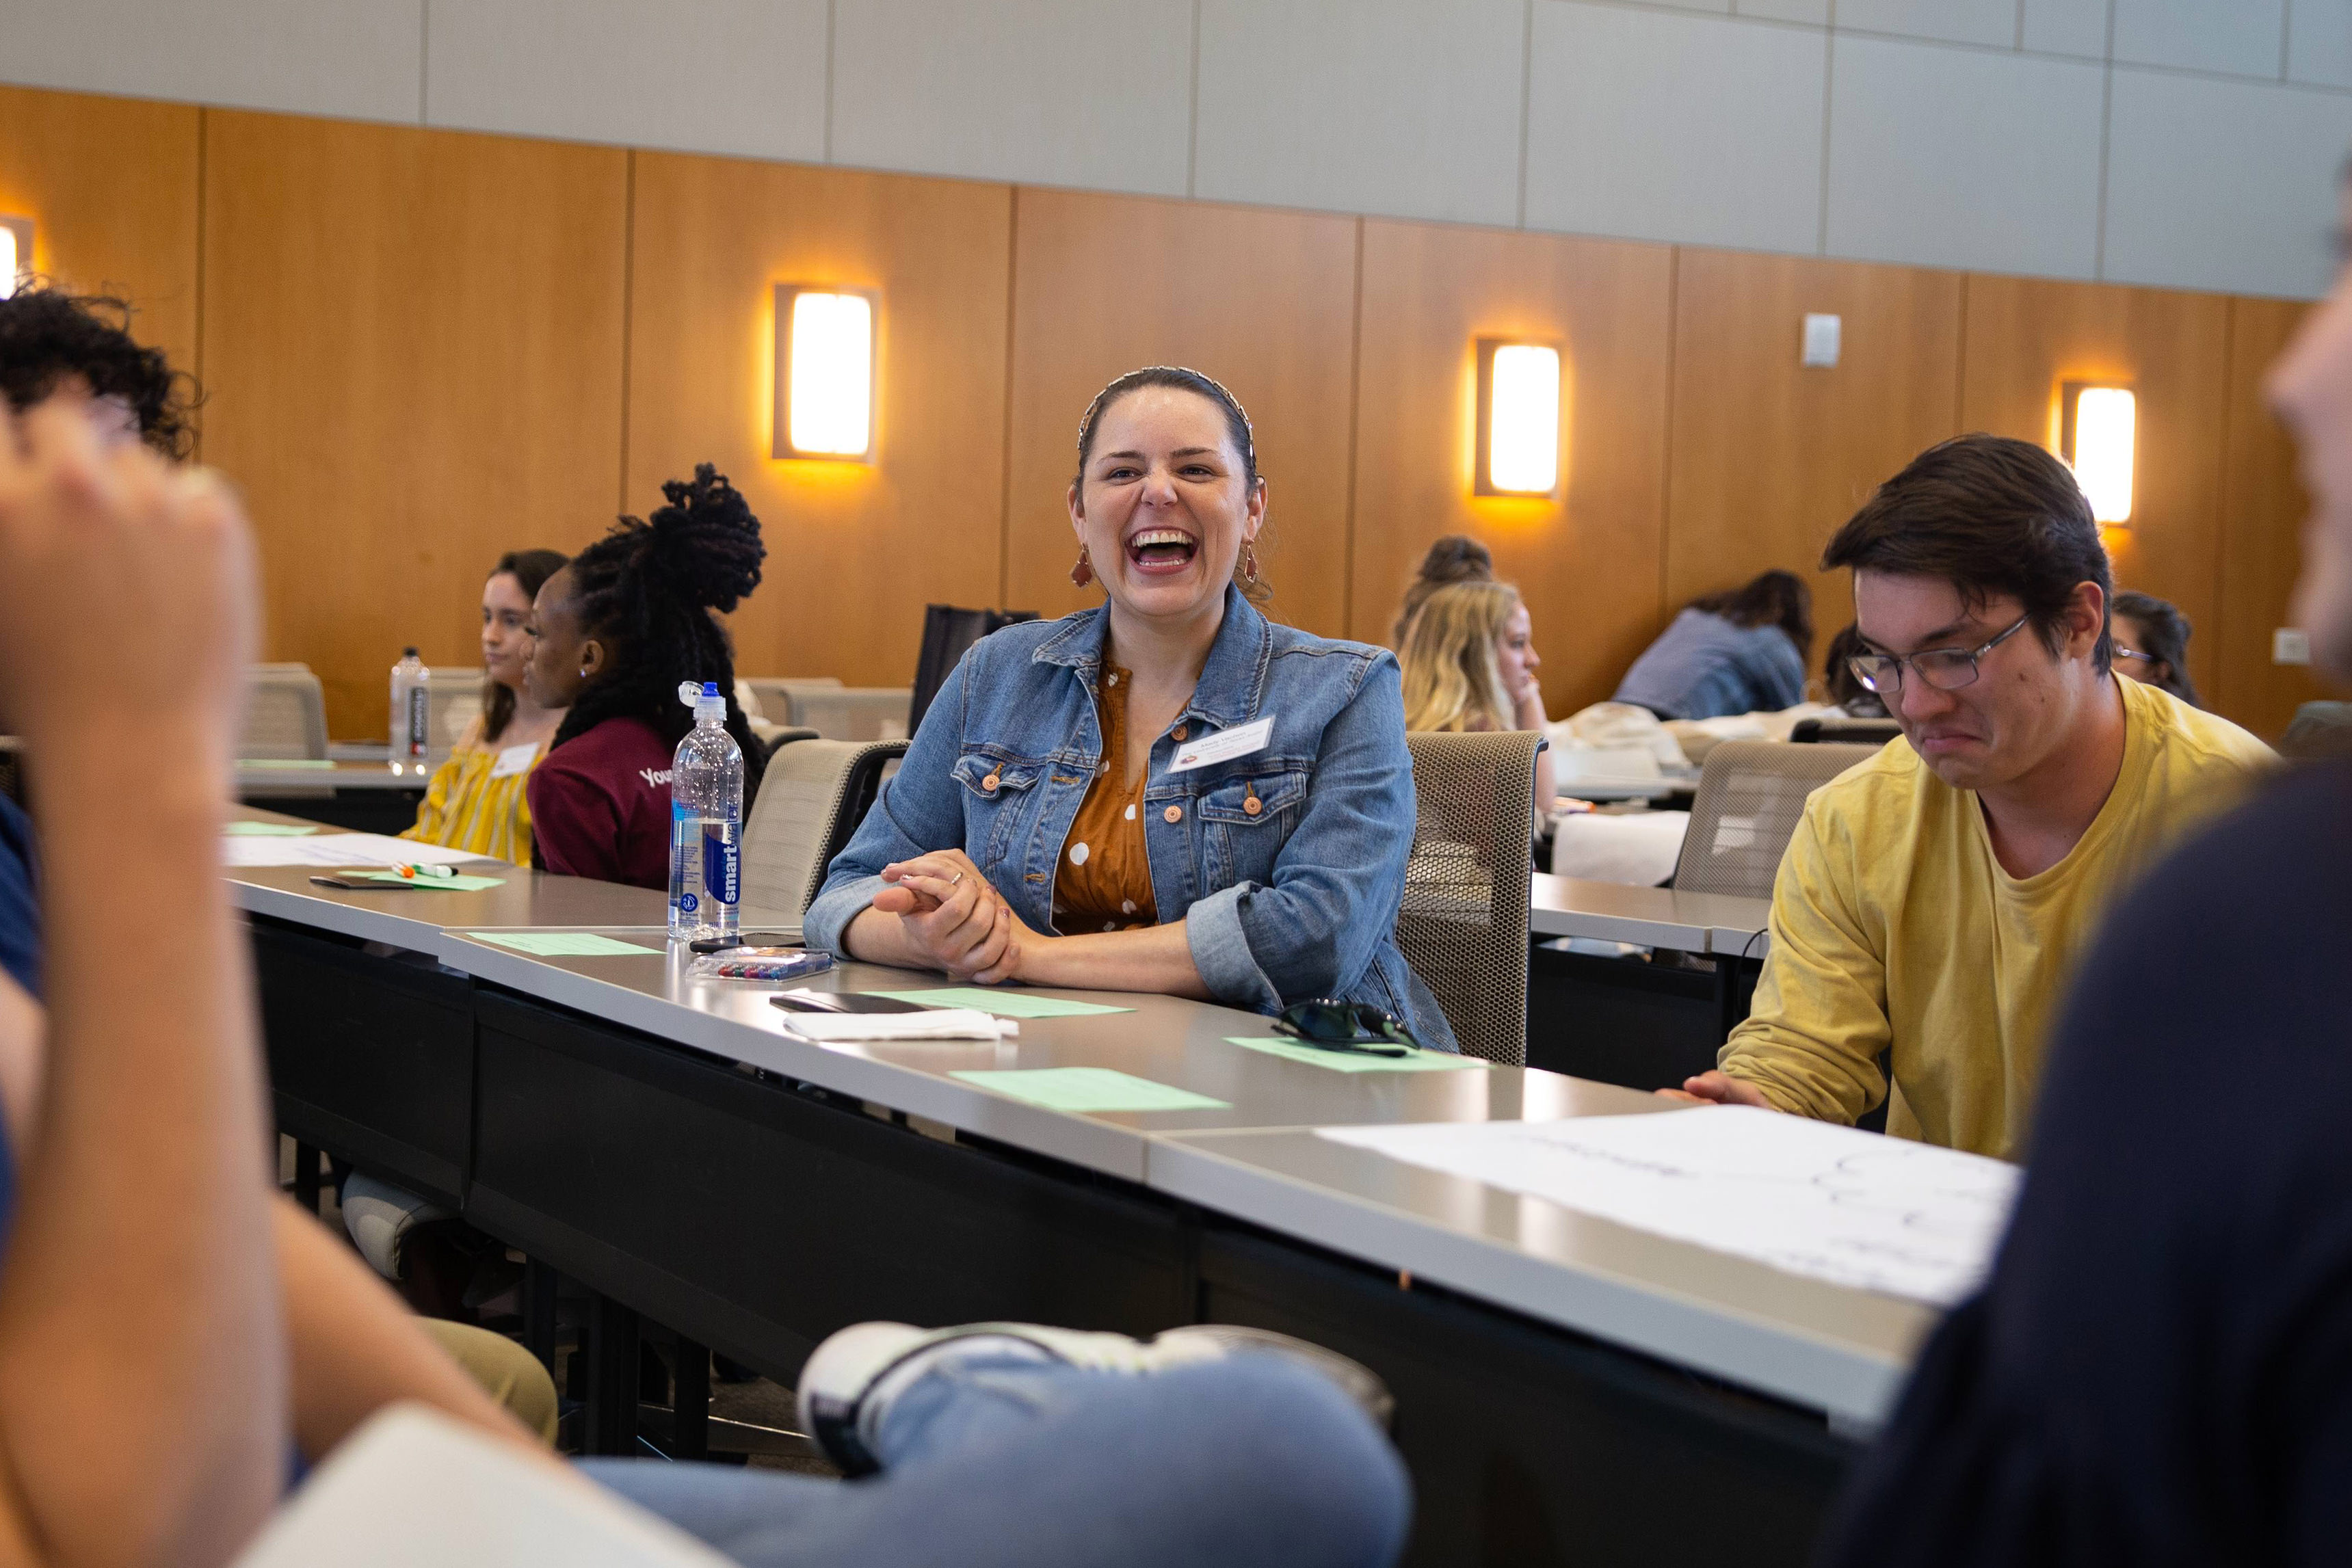 Mandy Vachon at the 2020 Transfer Student Leadership Summit